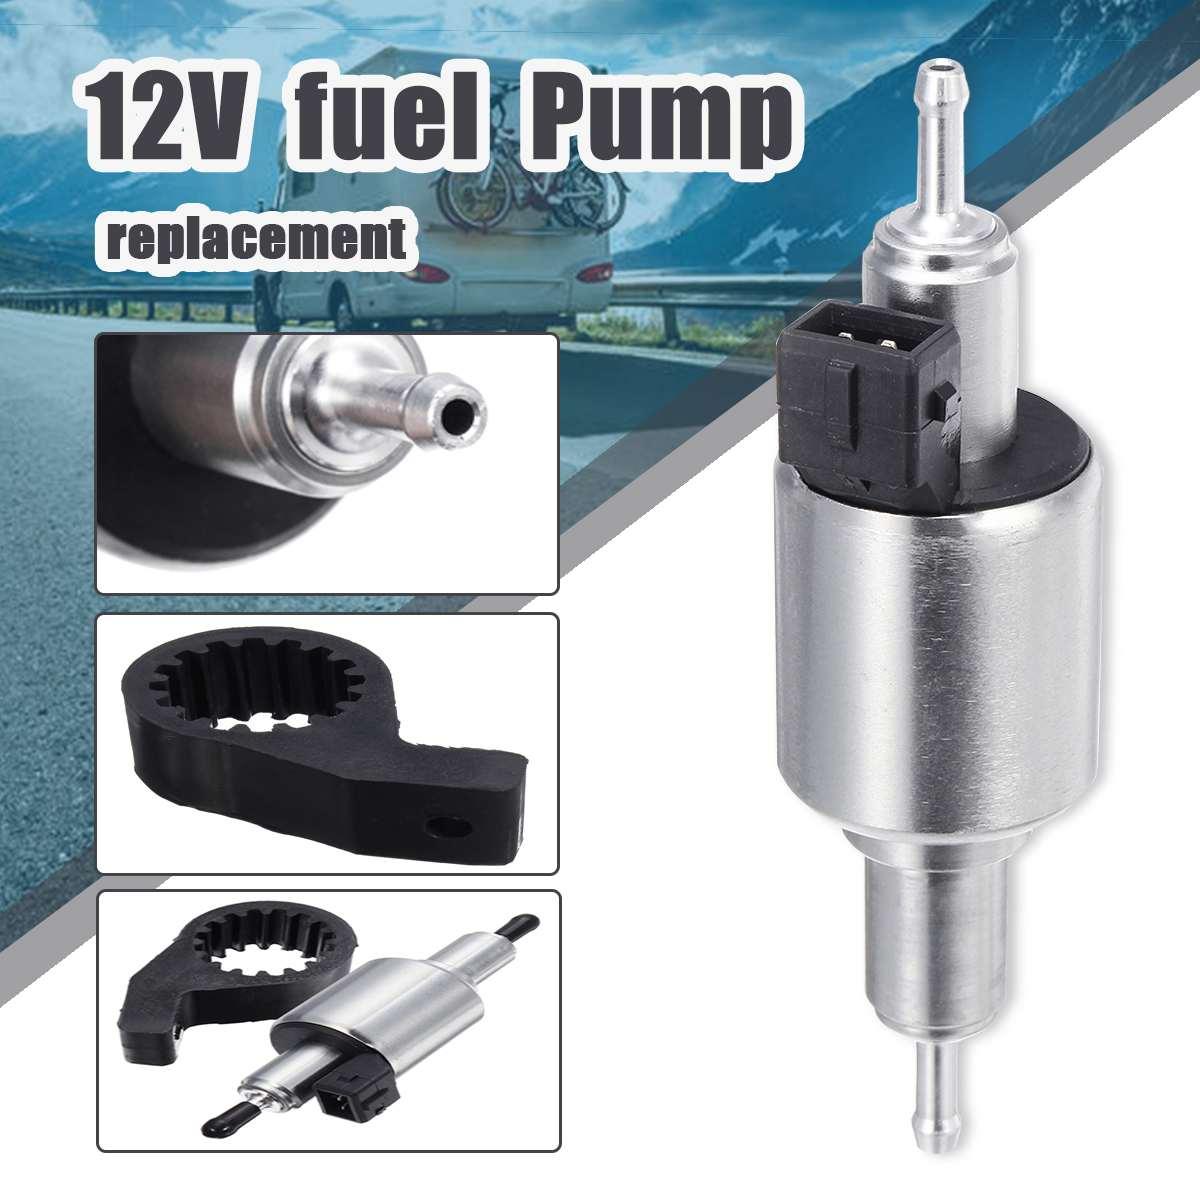 Universal Car Air Parking Heater Oil Fuel Pump 12V//24V Pulse Metering Gas Inline Electric Fuel Pump Kit Heater Pump for 2-5KW Webasto Eberspacher